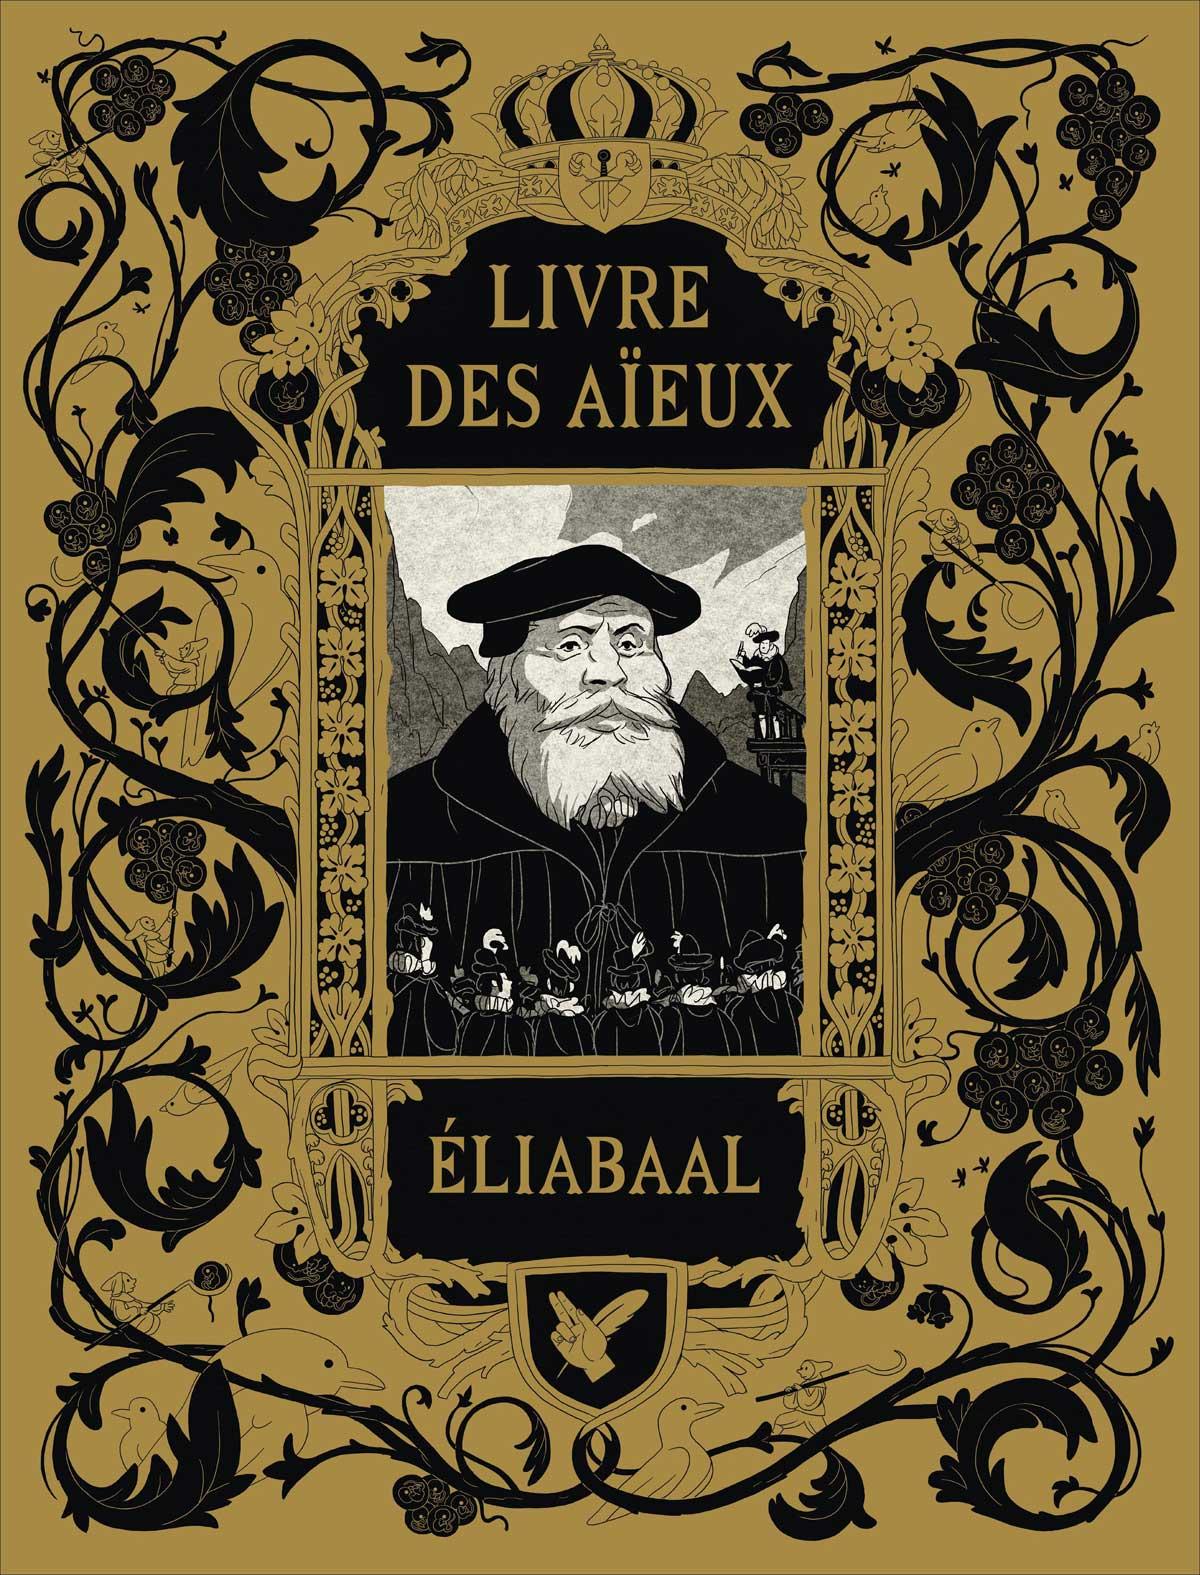 Petit de Hubert et Gatignol page 145